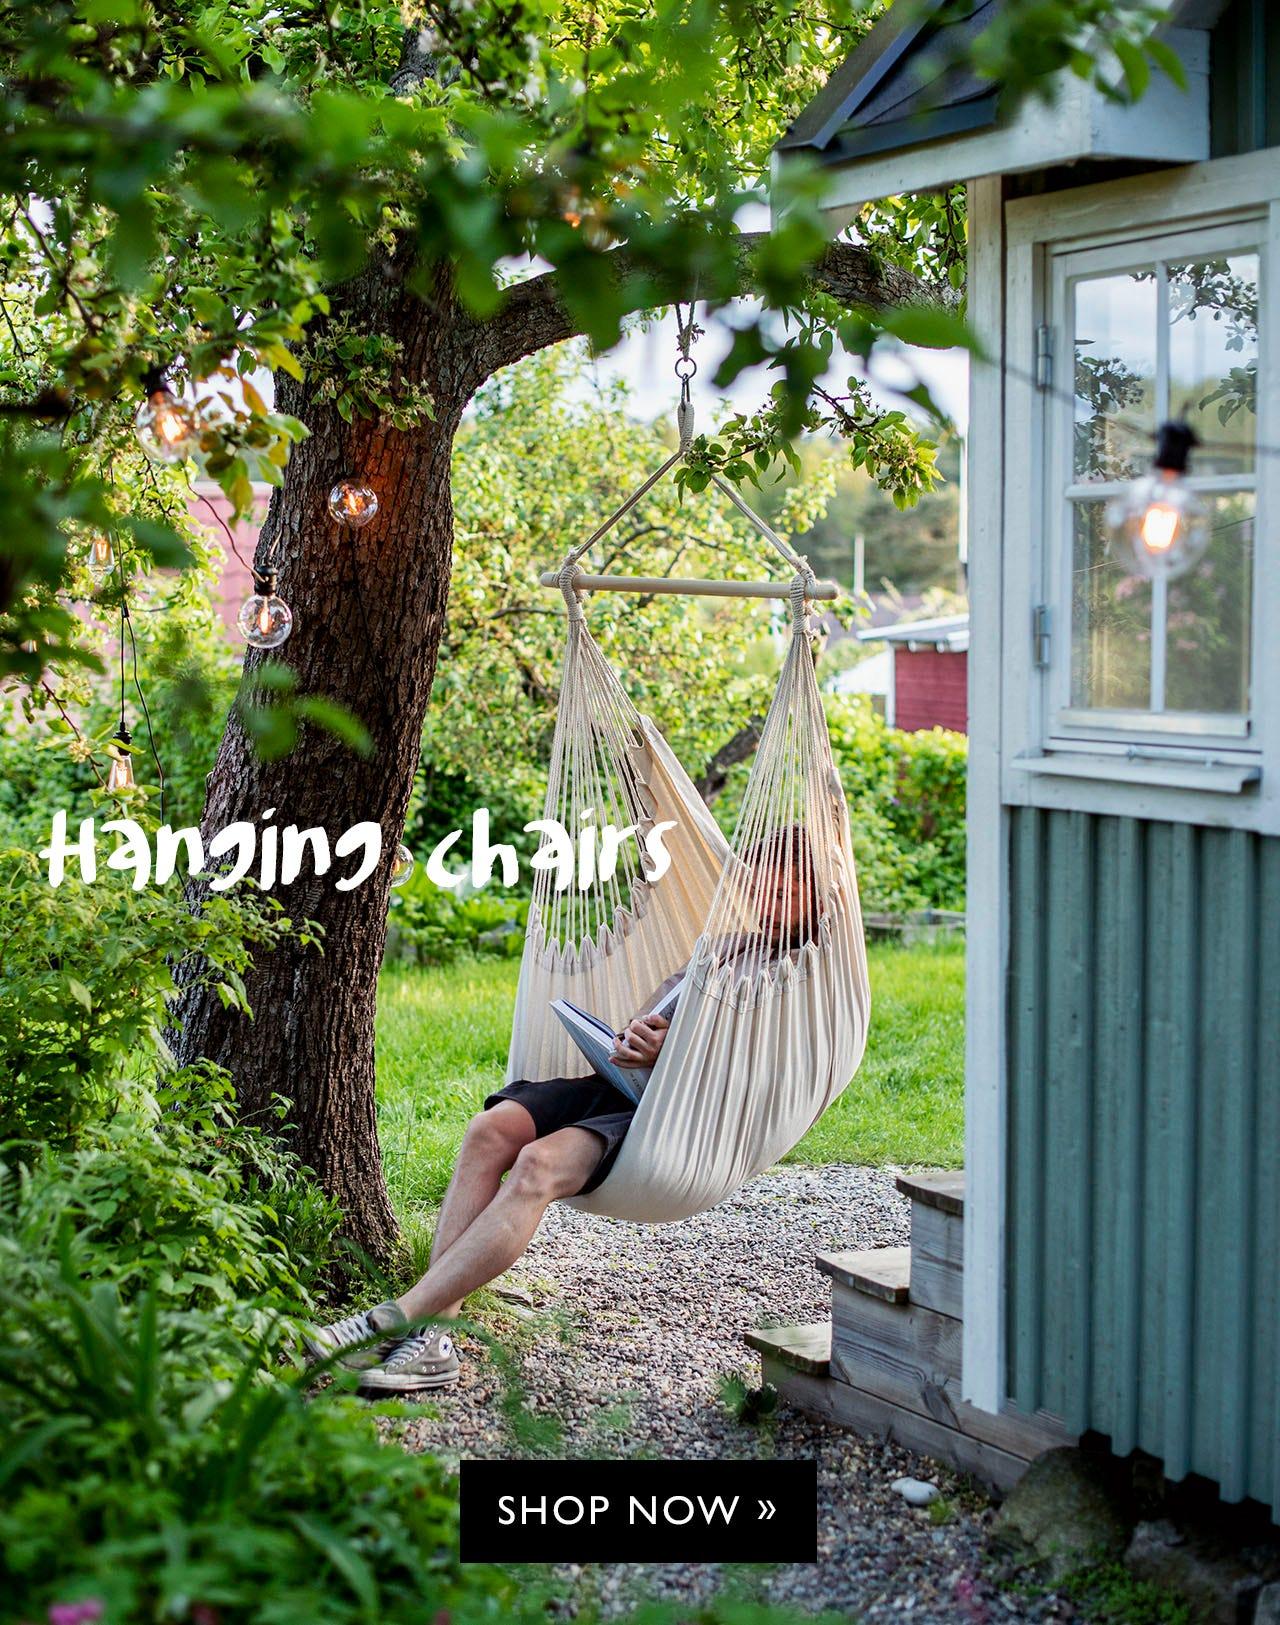 Hanging chairs, hammocks, hanging hammocks